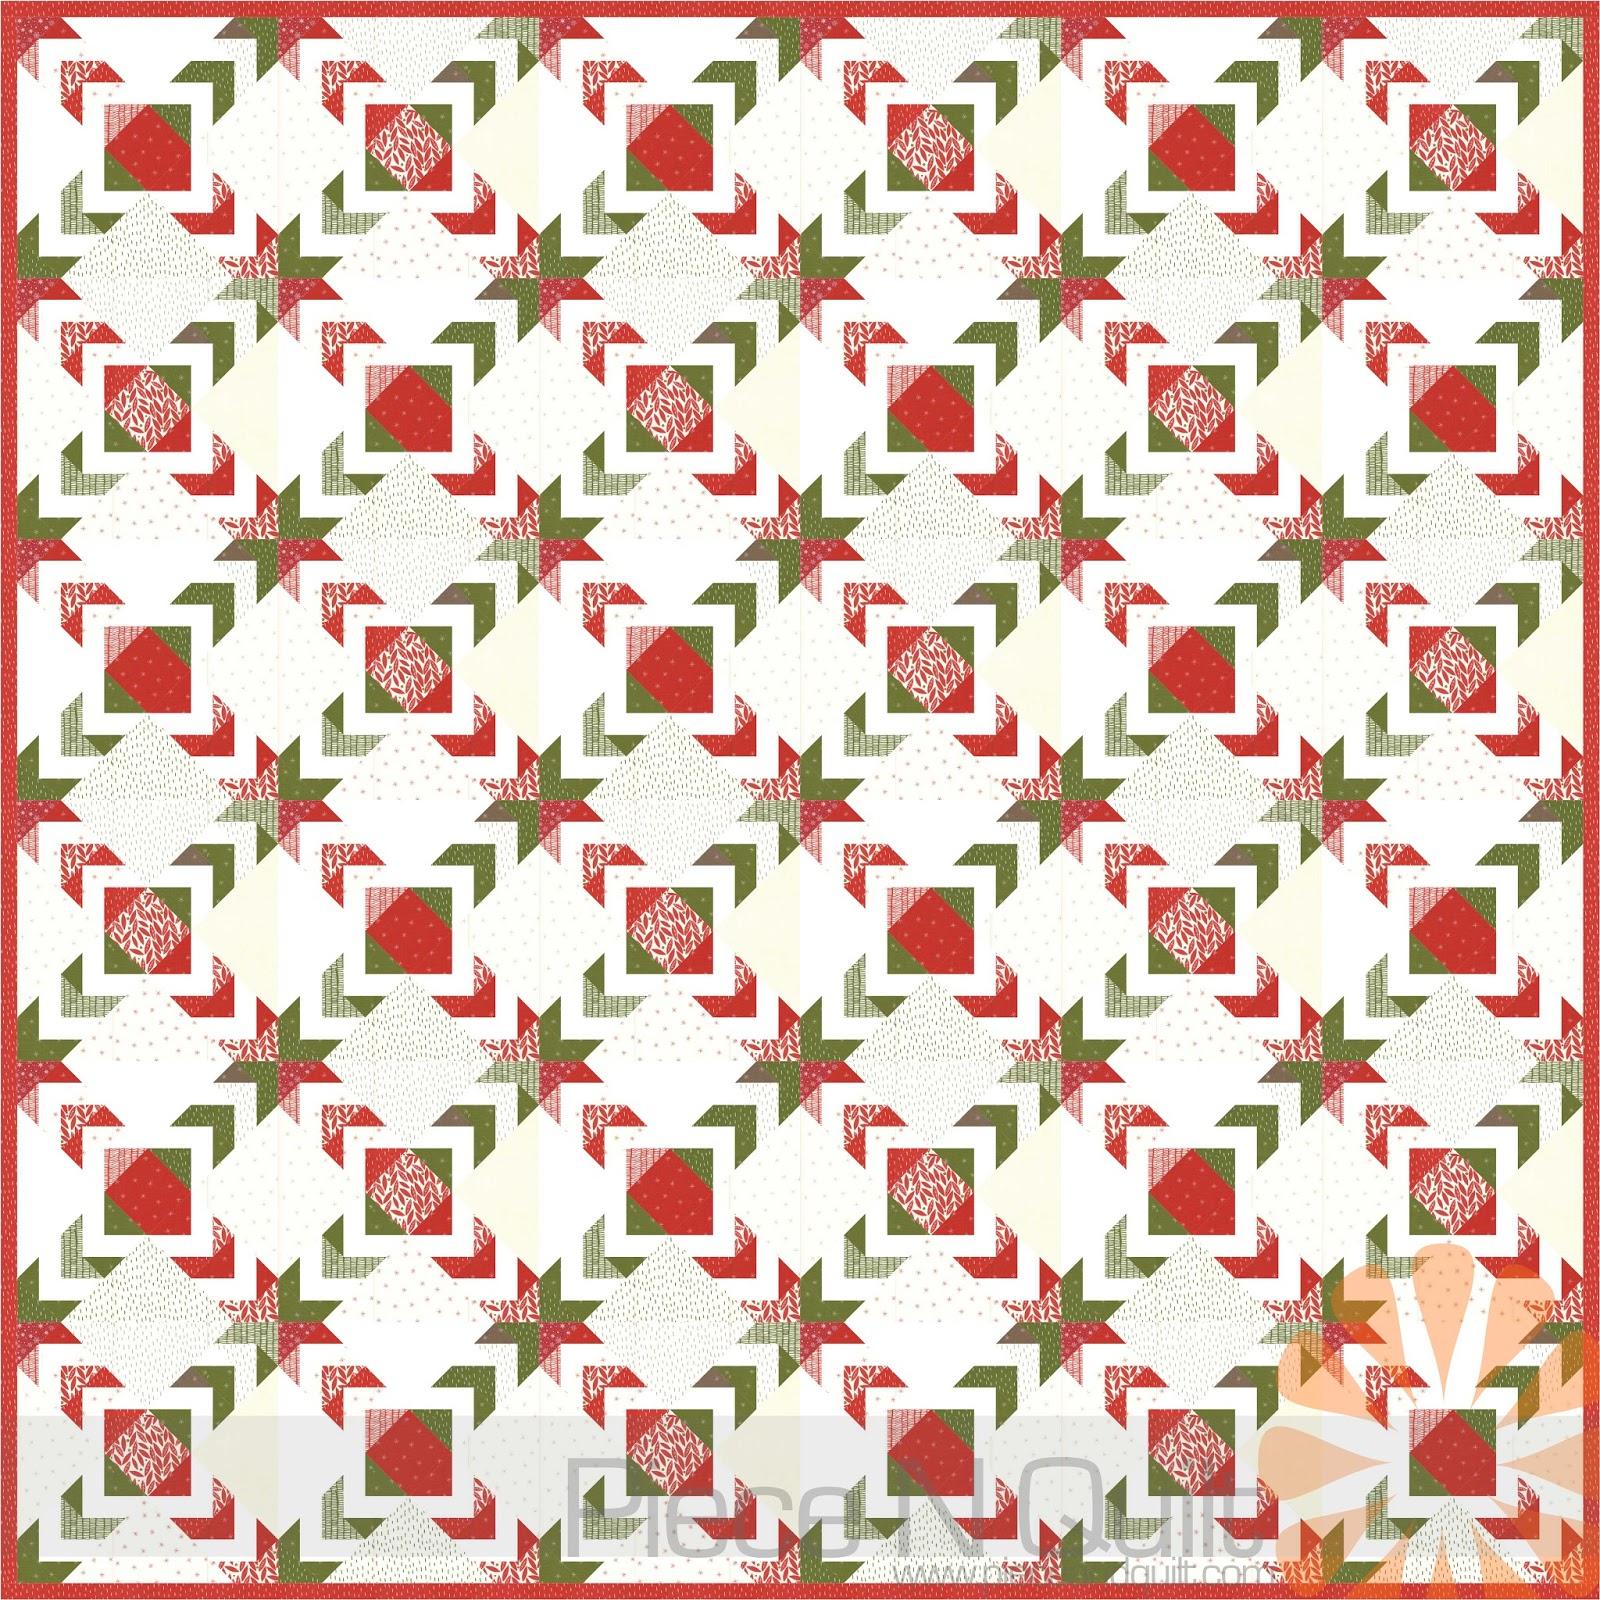 Piece N Quilt Spider Star Quilt A Free Christmas Quilt Tutorial